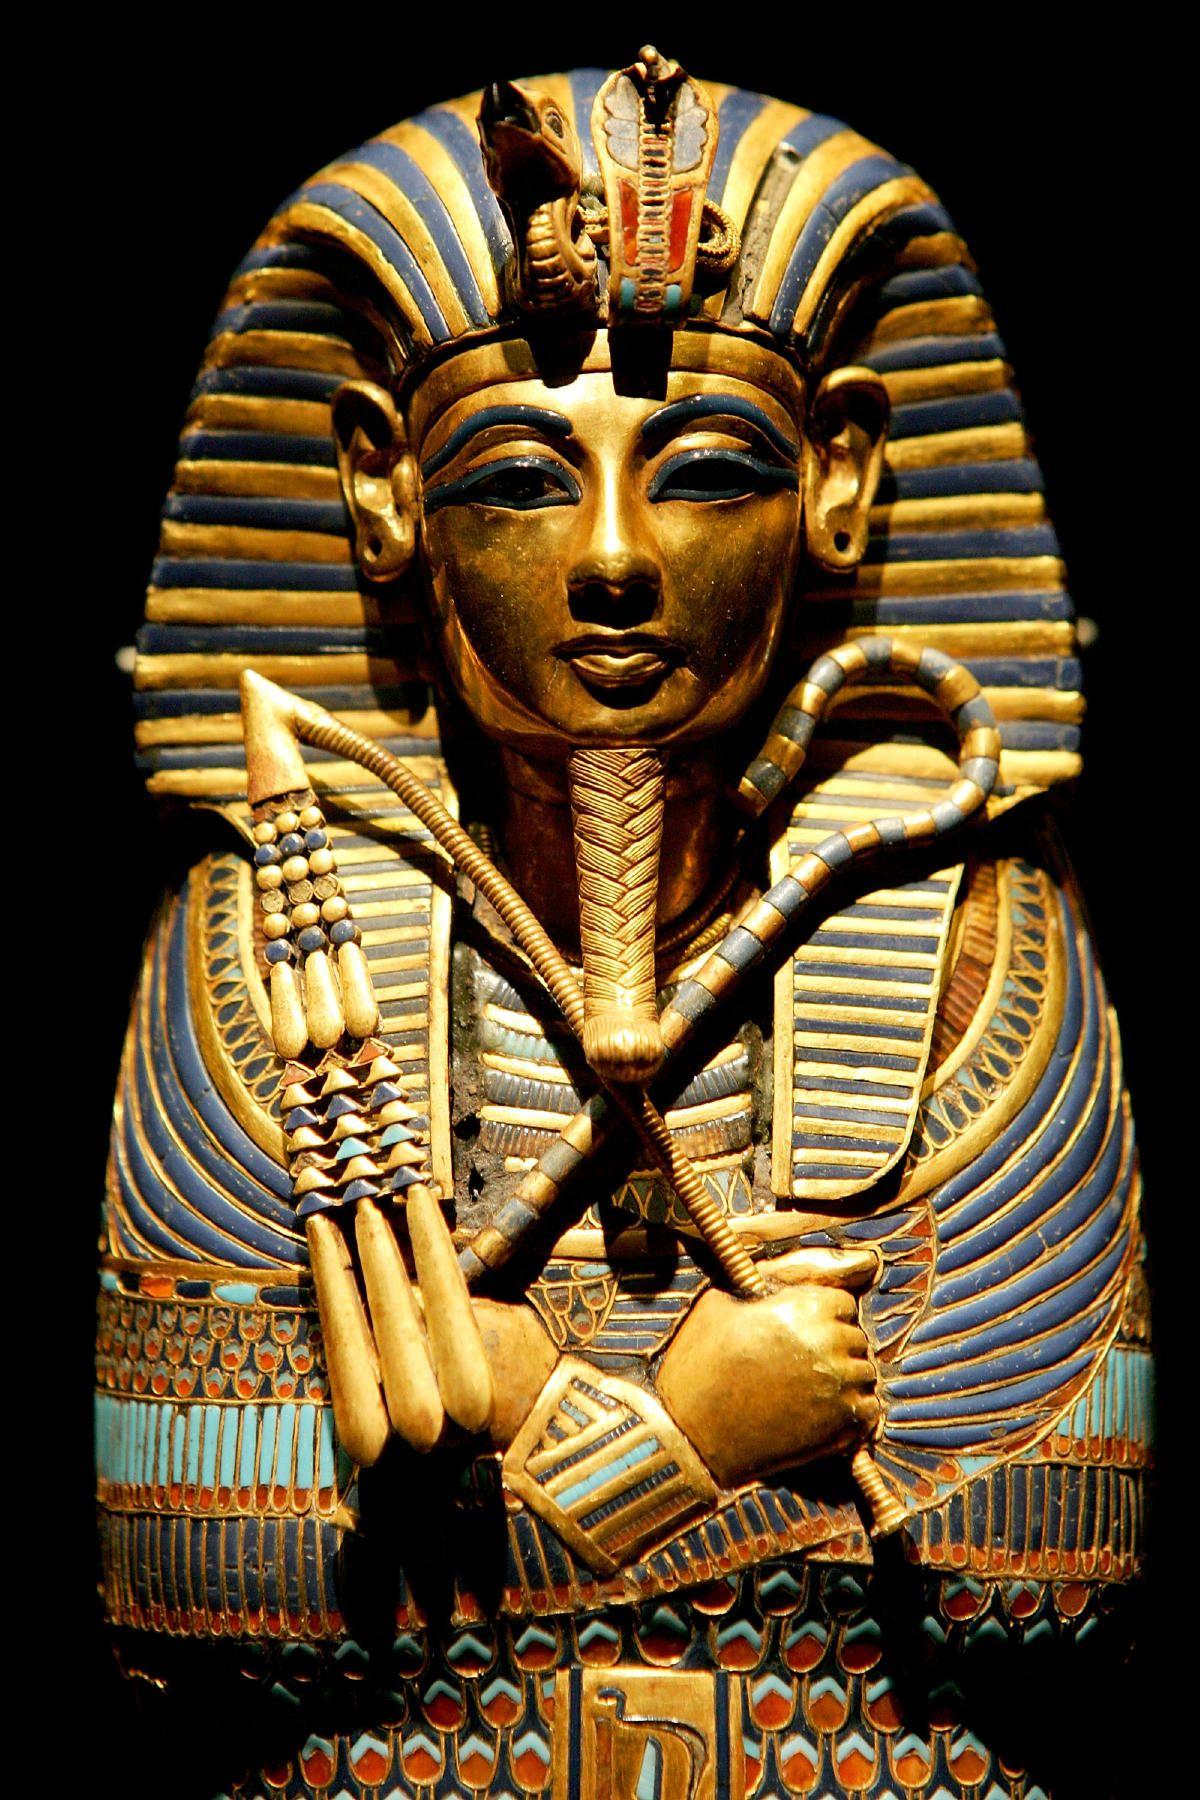 себе разведение картинки про фараона частности, демонстрируют